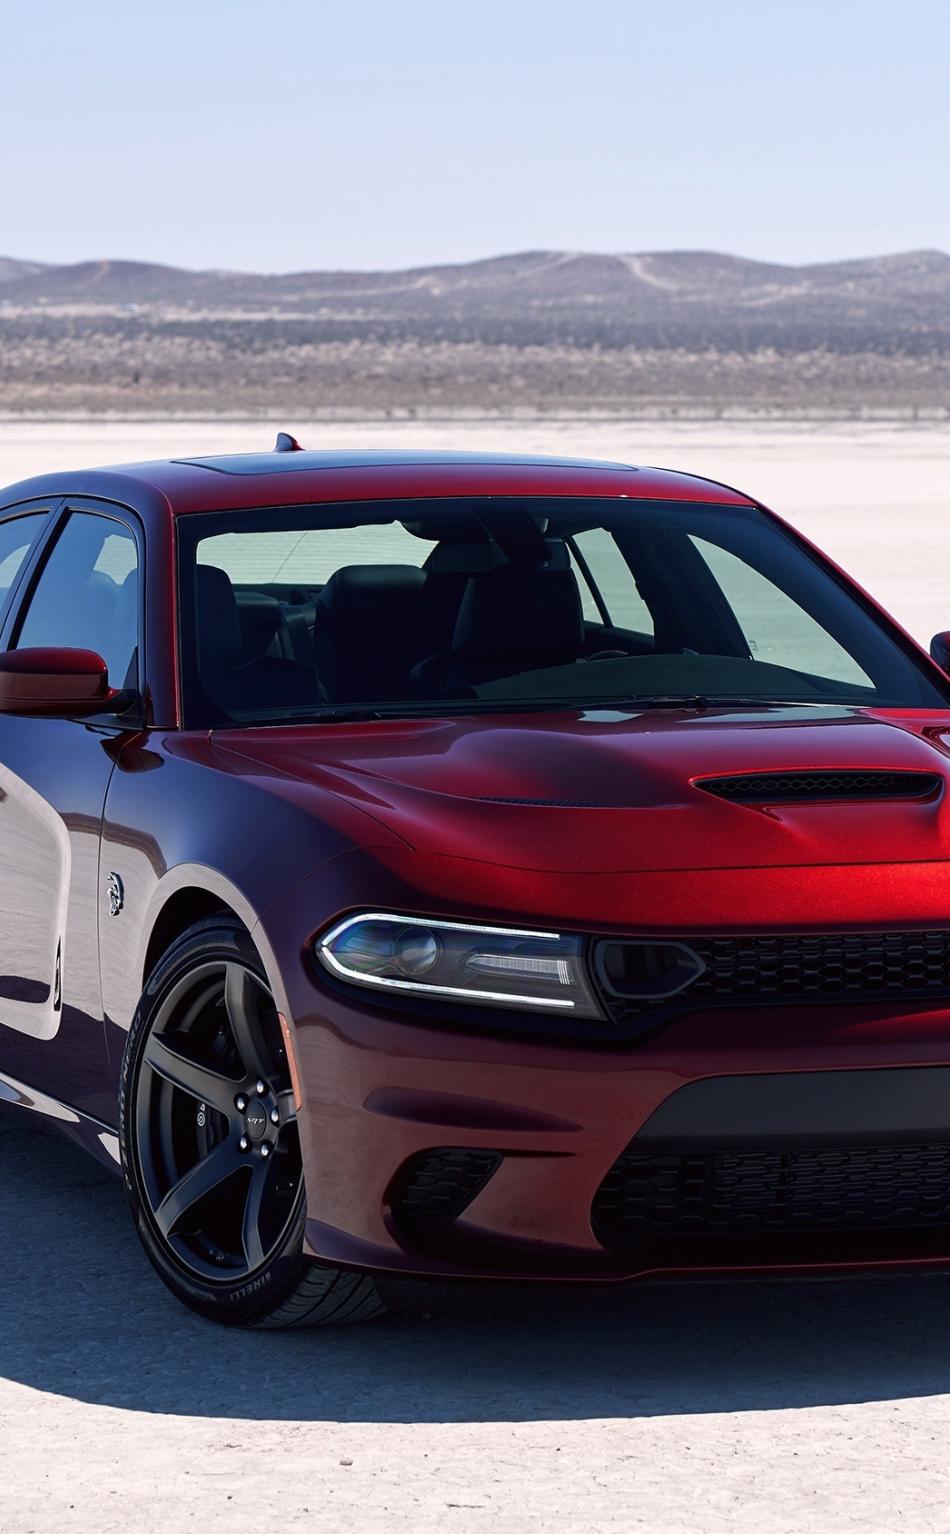 Download 950x1534 Wallpaper Red Off Road Dodge Charger Srt